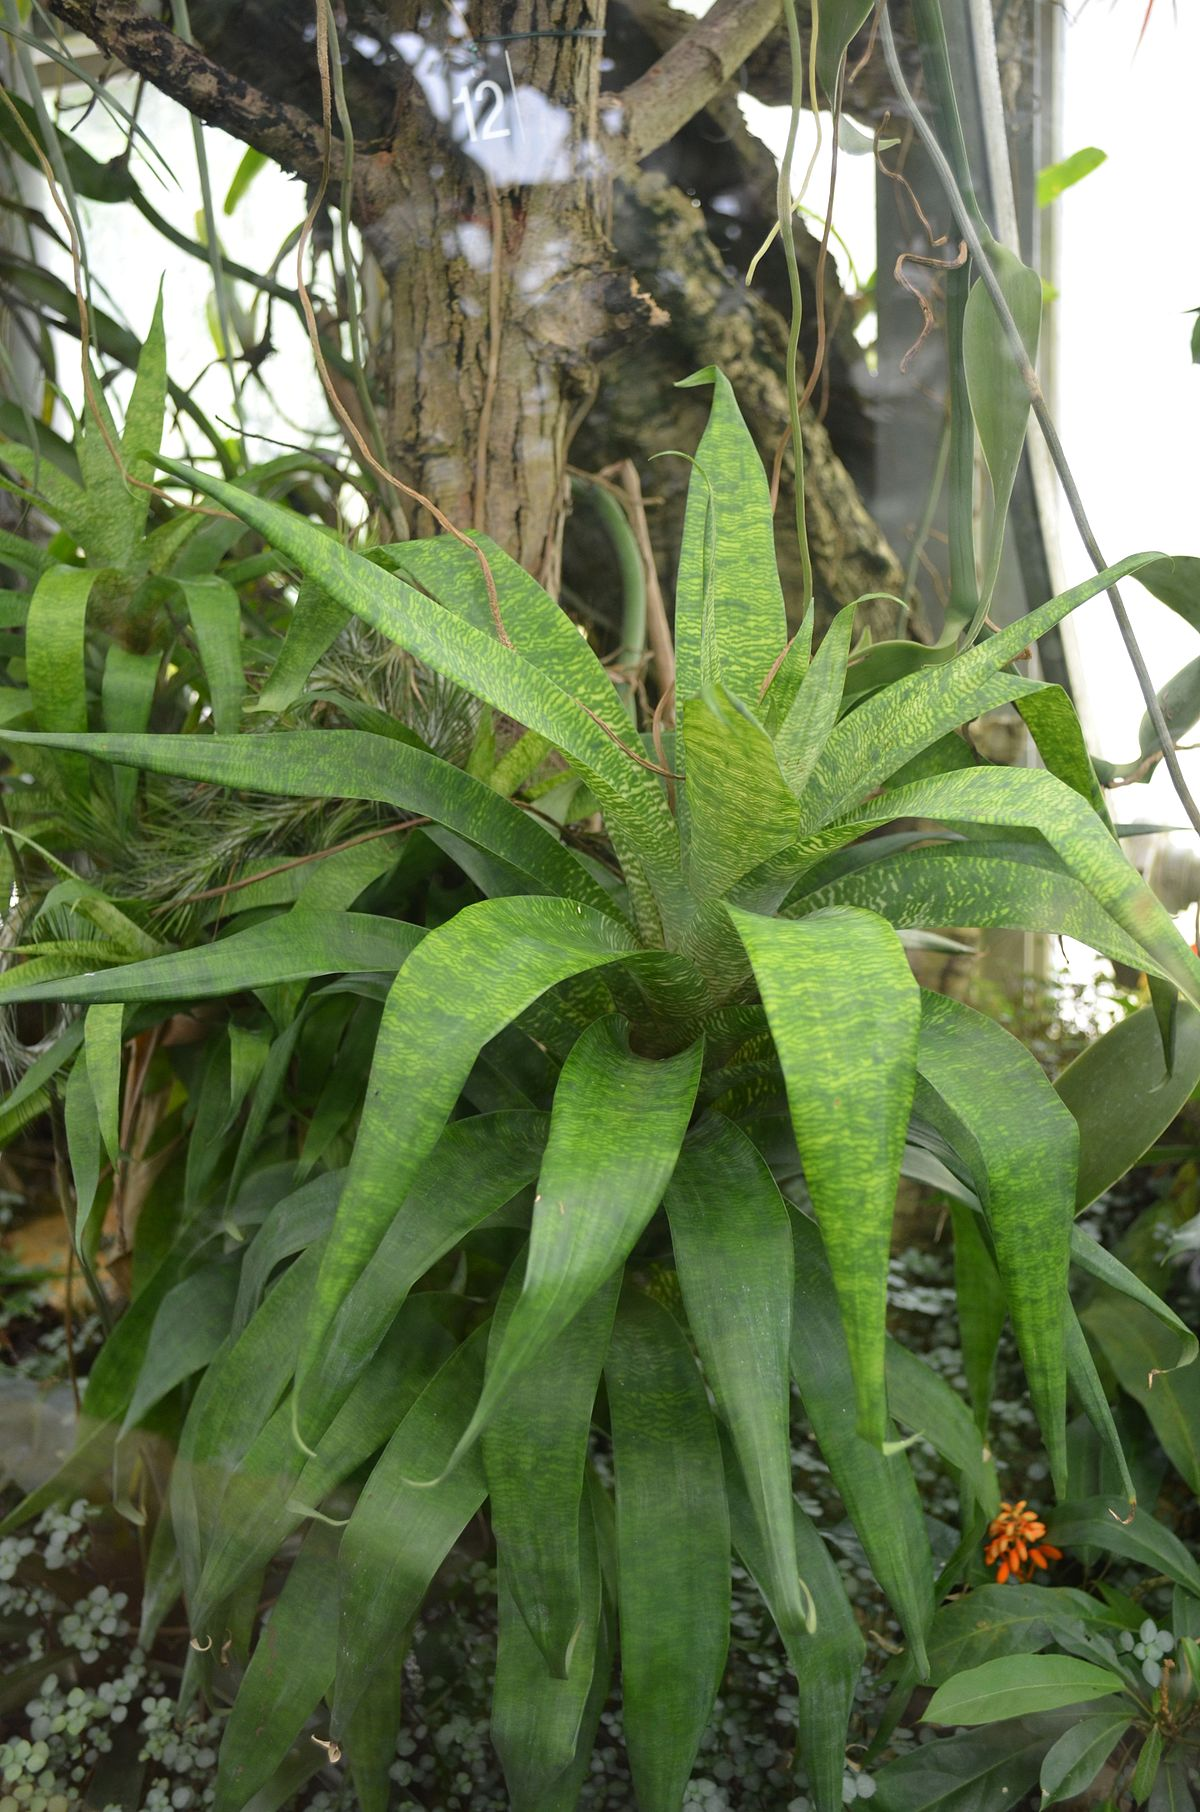 Guzmania subcorymbosa wikidata for Bal des citrouilles jardin botanique